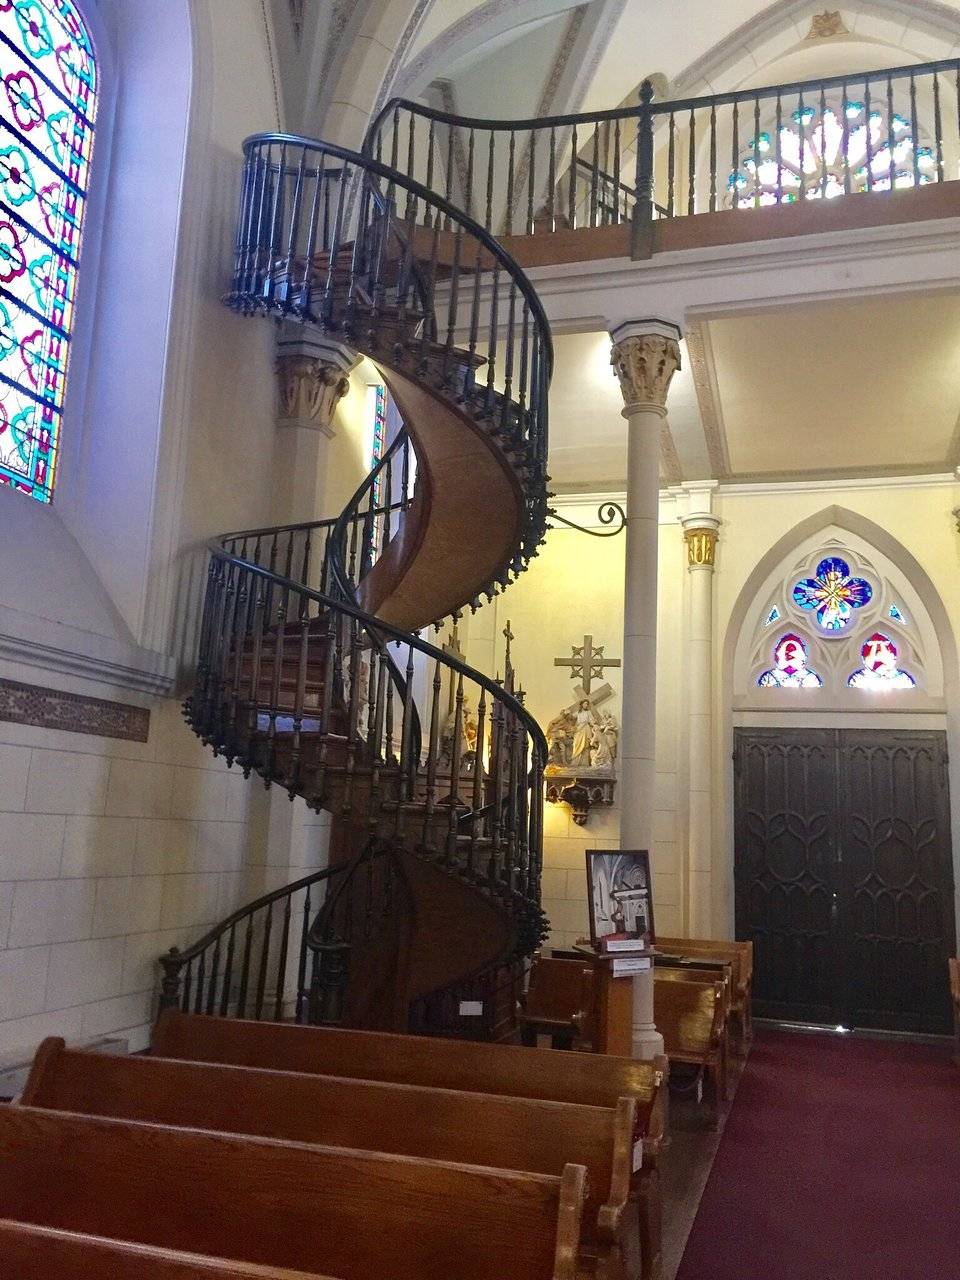 Loretto Chapel Santa Fe Tripadvisor | Spiral Staircase Loretto Chapel | St Joseph | Immaculate | Kentucky Sisters | Explained | Stairway